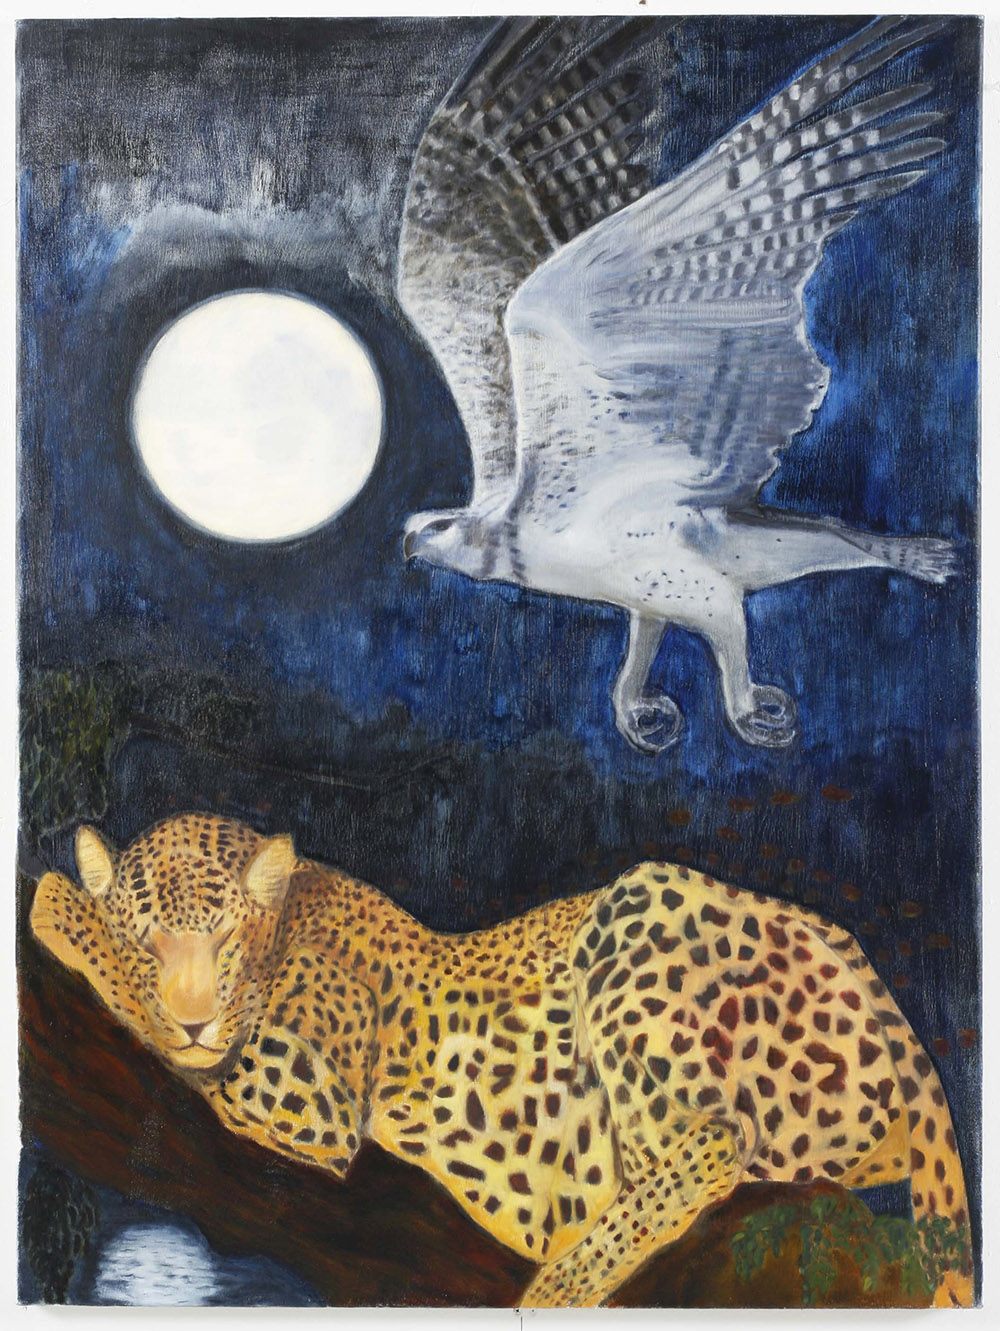 10.-Ono-A-Dream-2010.-Oil-on-canvas-121.9-x-91.4-cm-x.jpg